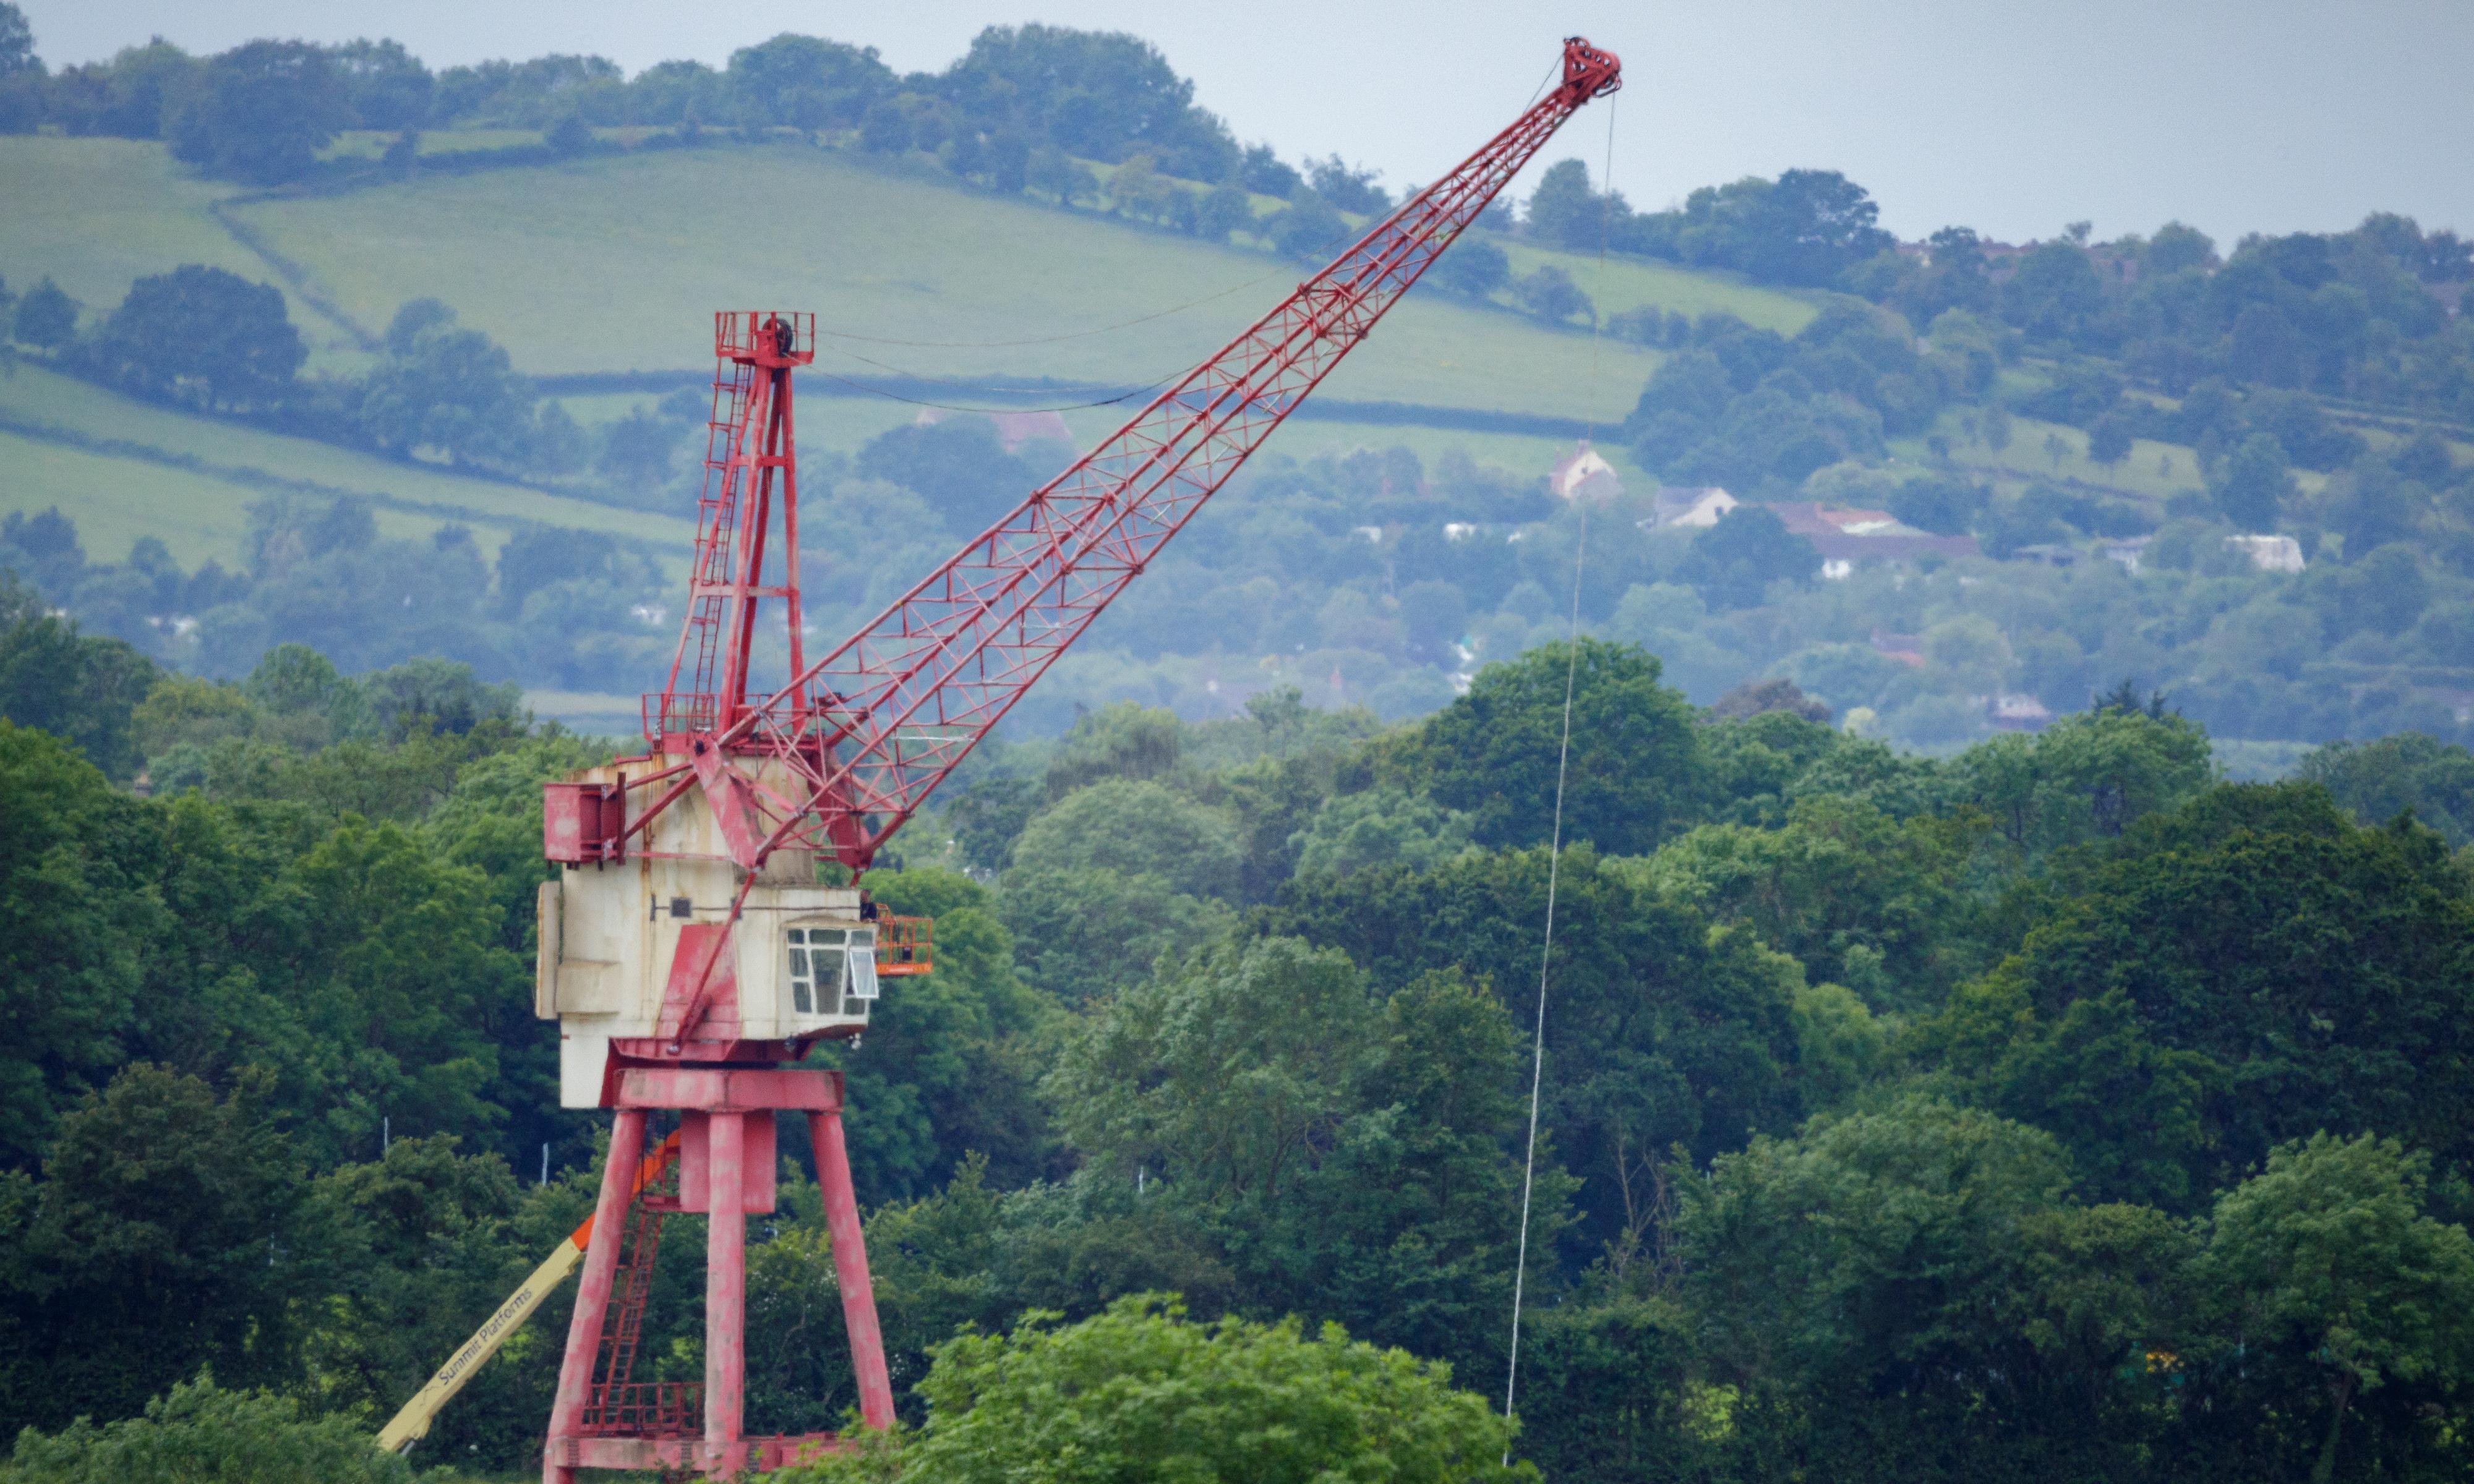 The 140-tonne, fire-breathing crane: inside Glastonbury's hottest attraction